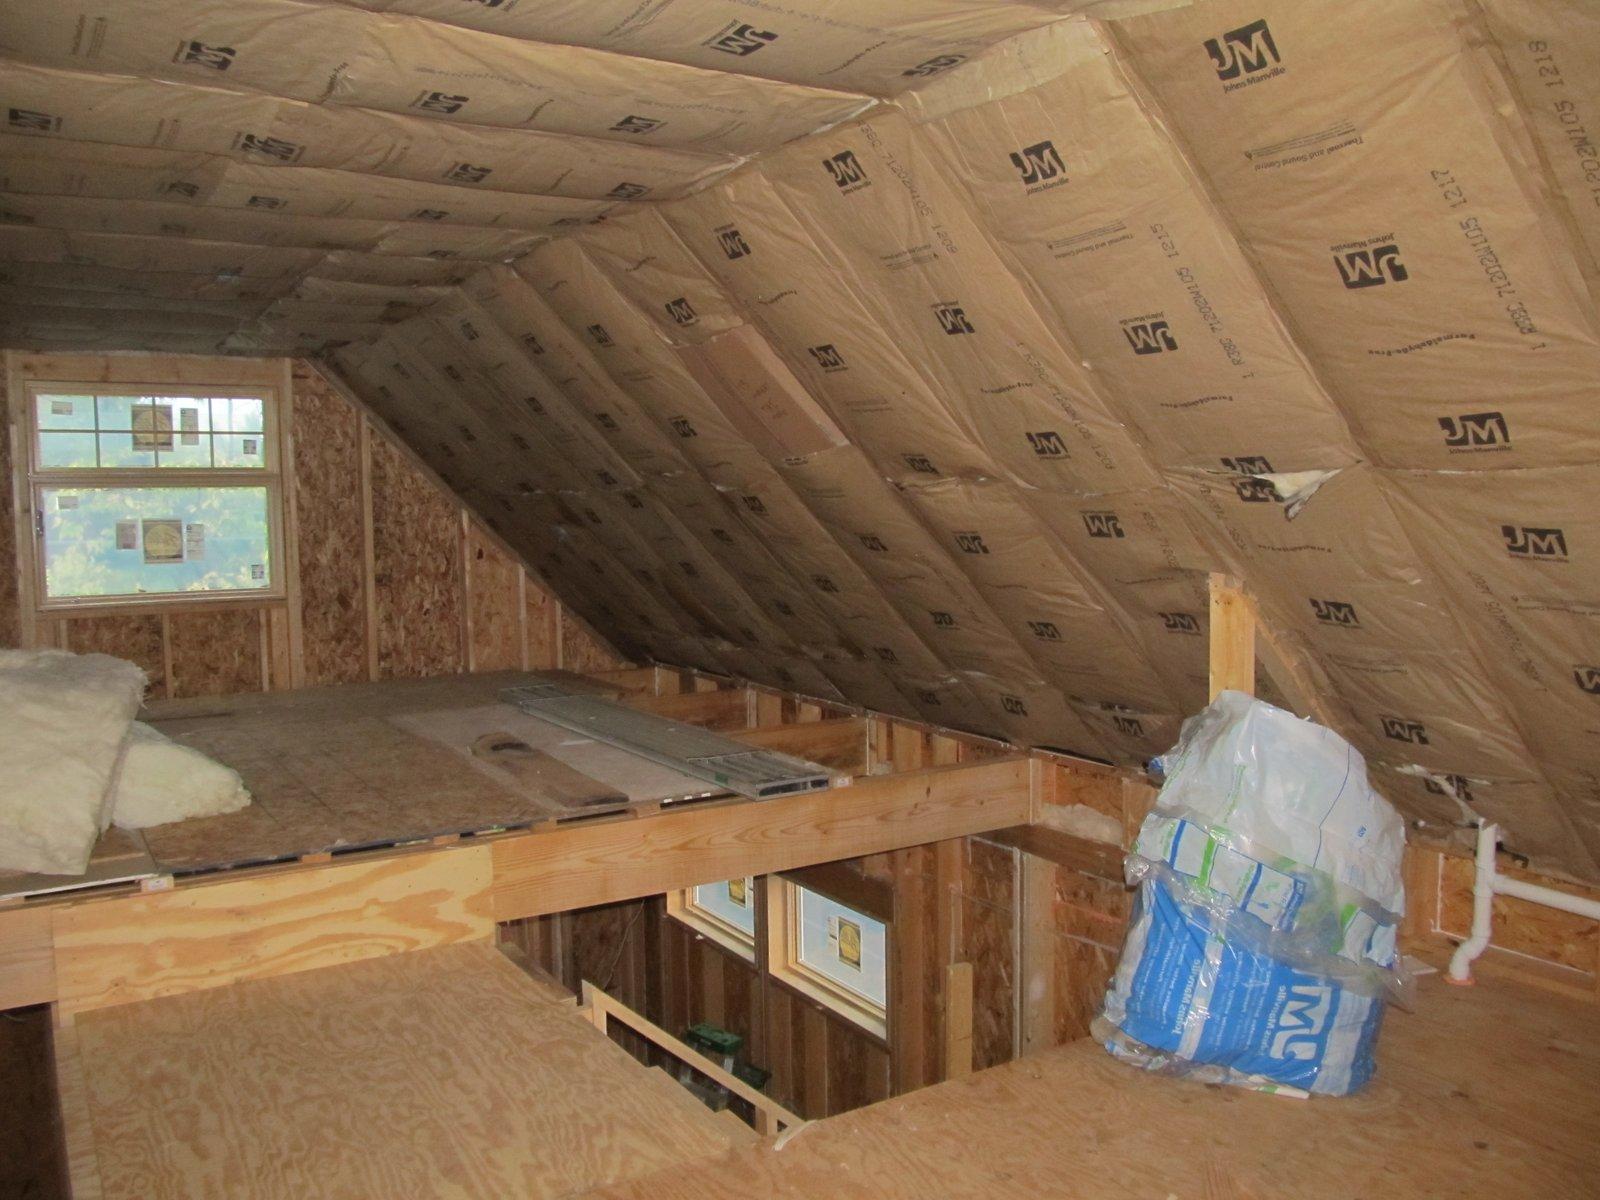 Photo store owens corning fiberglass loose fill insulation for Loose fill fiberglass insulation